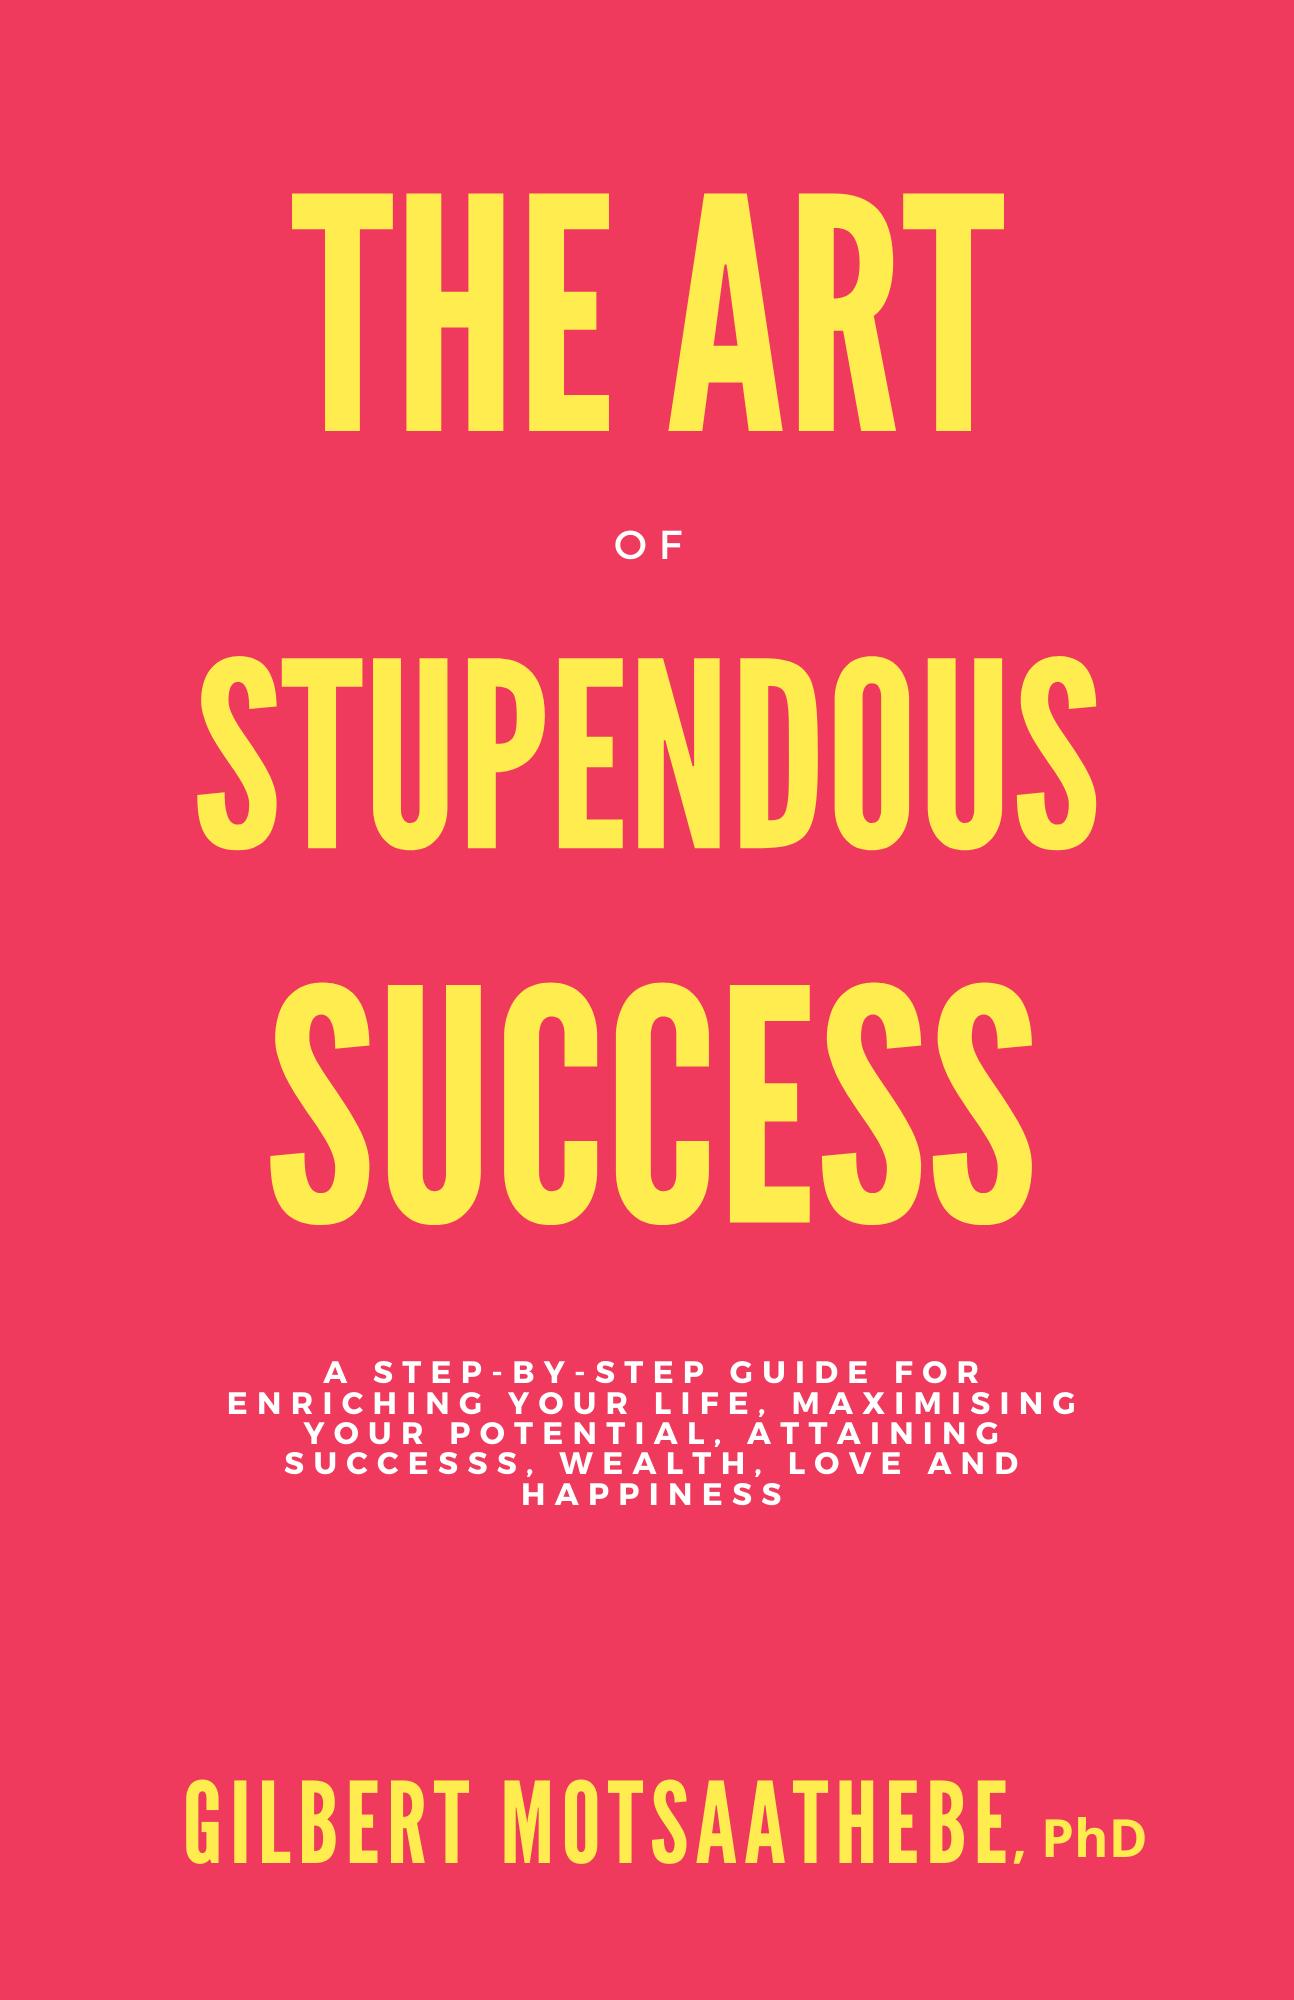 The Art of Stupendous Success by Gilbert Motsaathebe